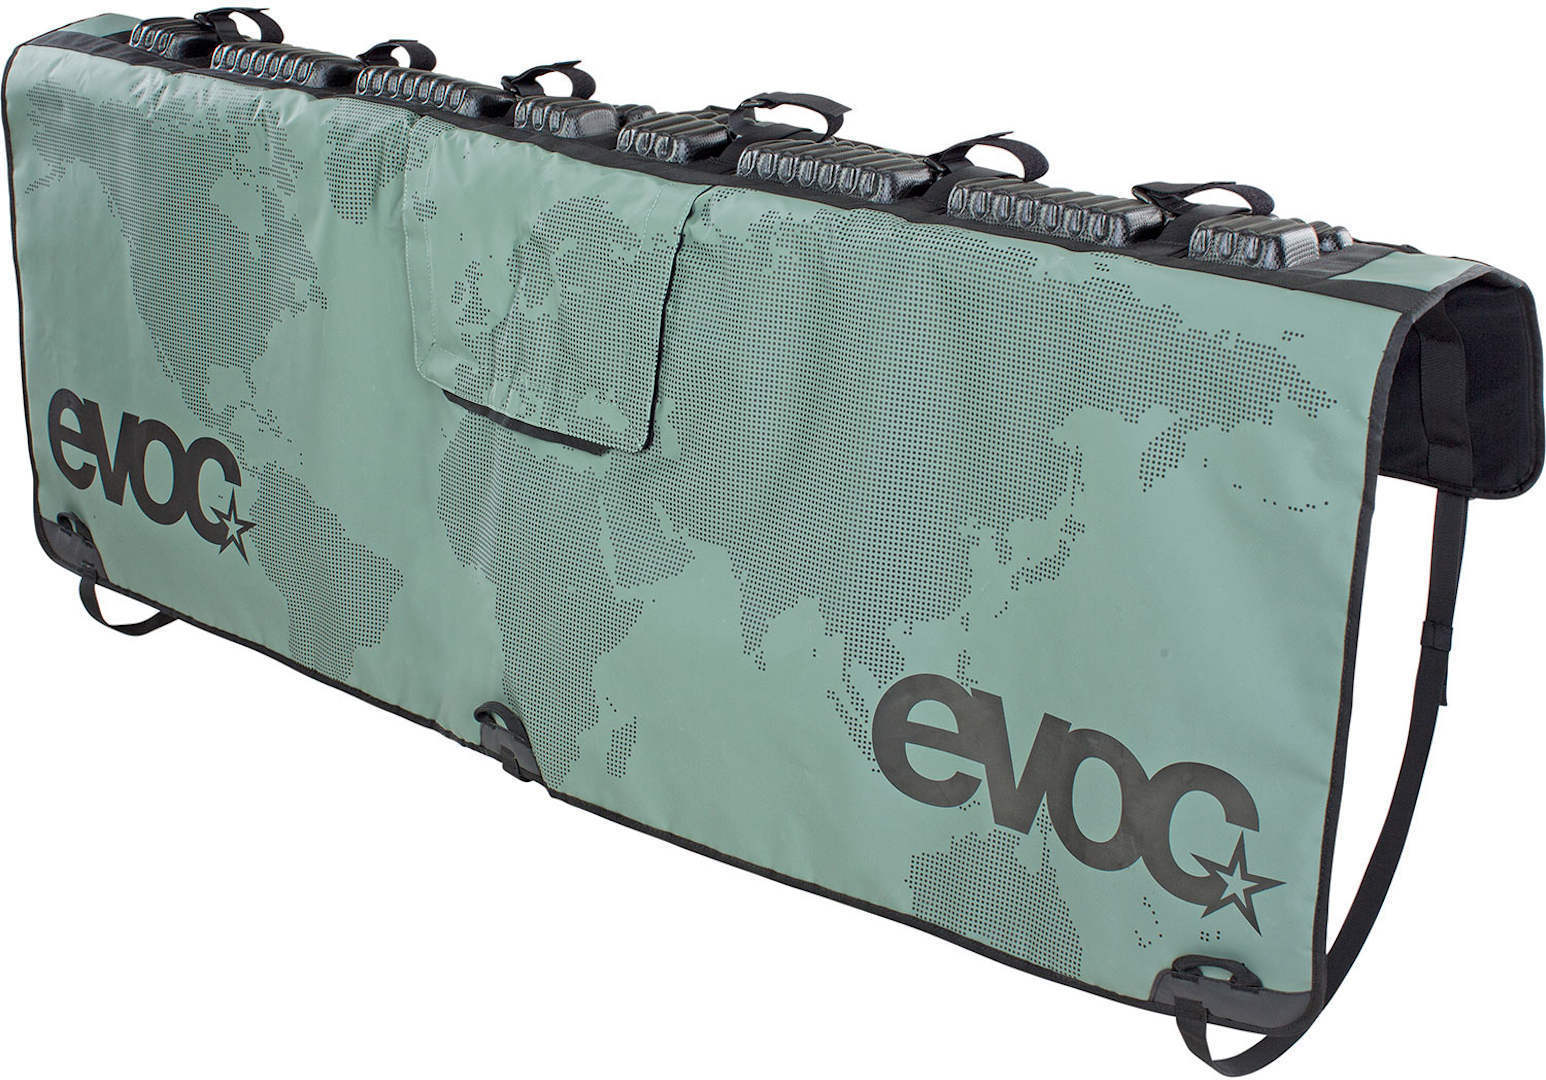 Evoc Tailgate Pad Transportschutz, grün, Größe XL, grün, Größe XL